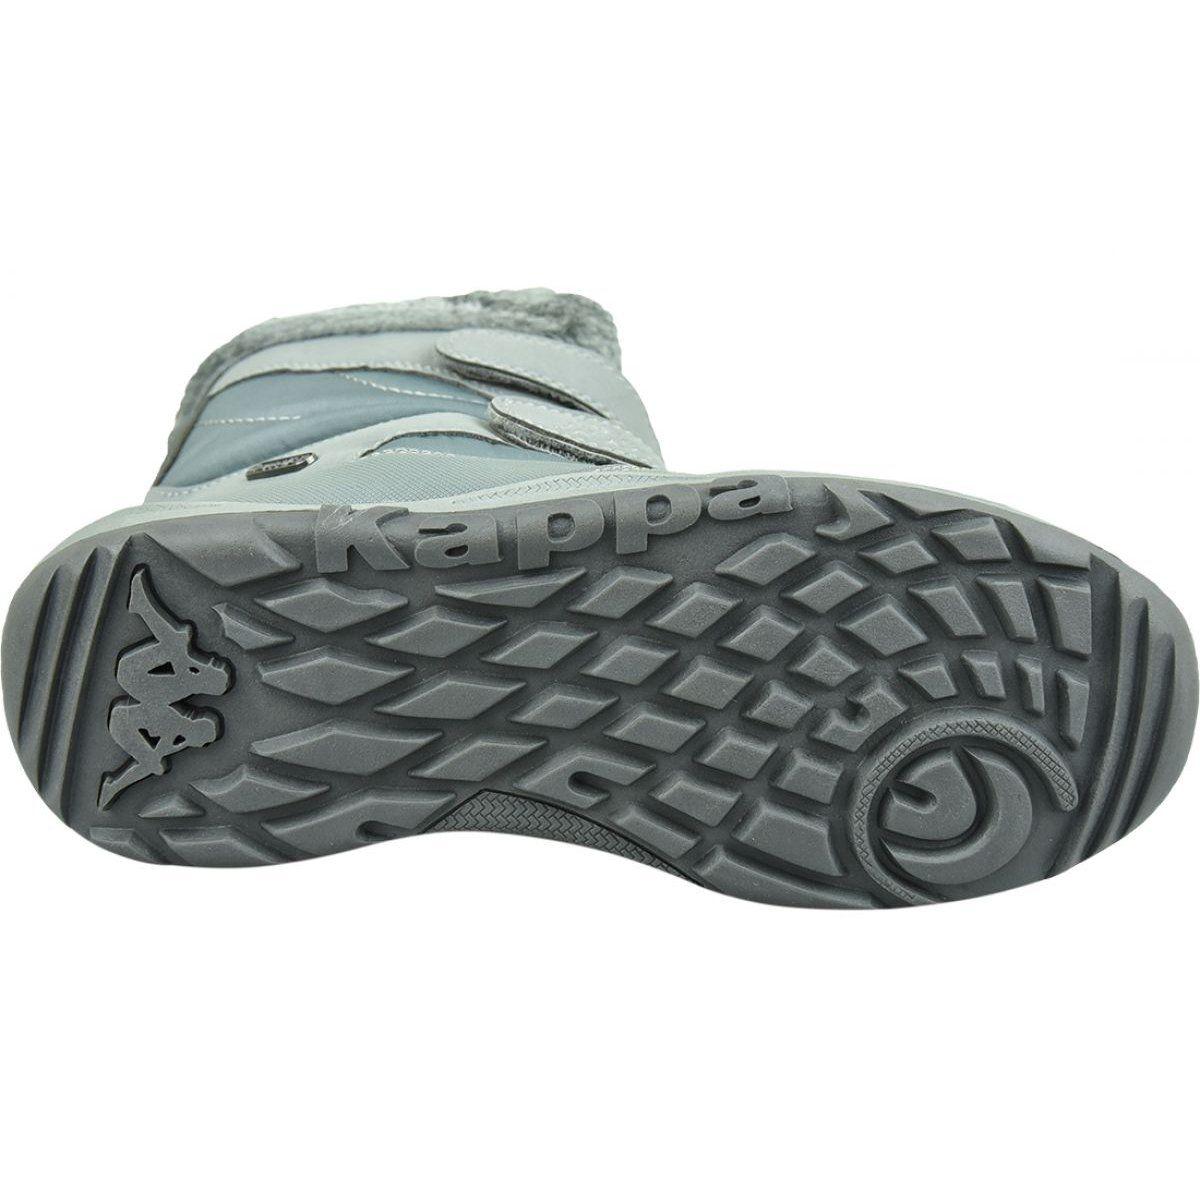 Buty Zimowe Kappa Gurli Tex Jr 260728k 1615 Szare Winter Boots Winter Shoes Childrens Shoes